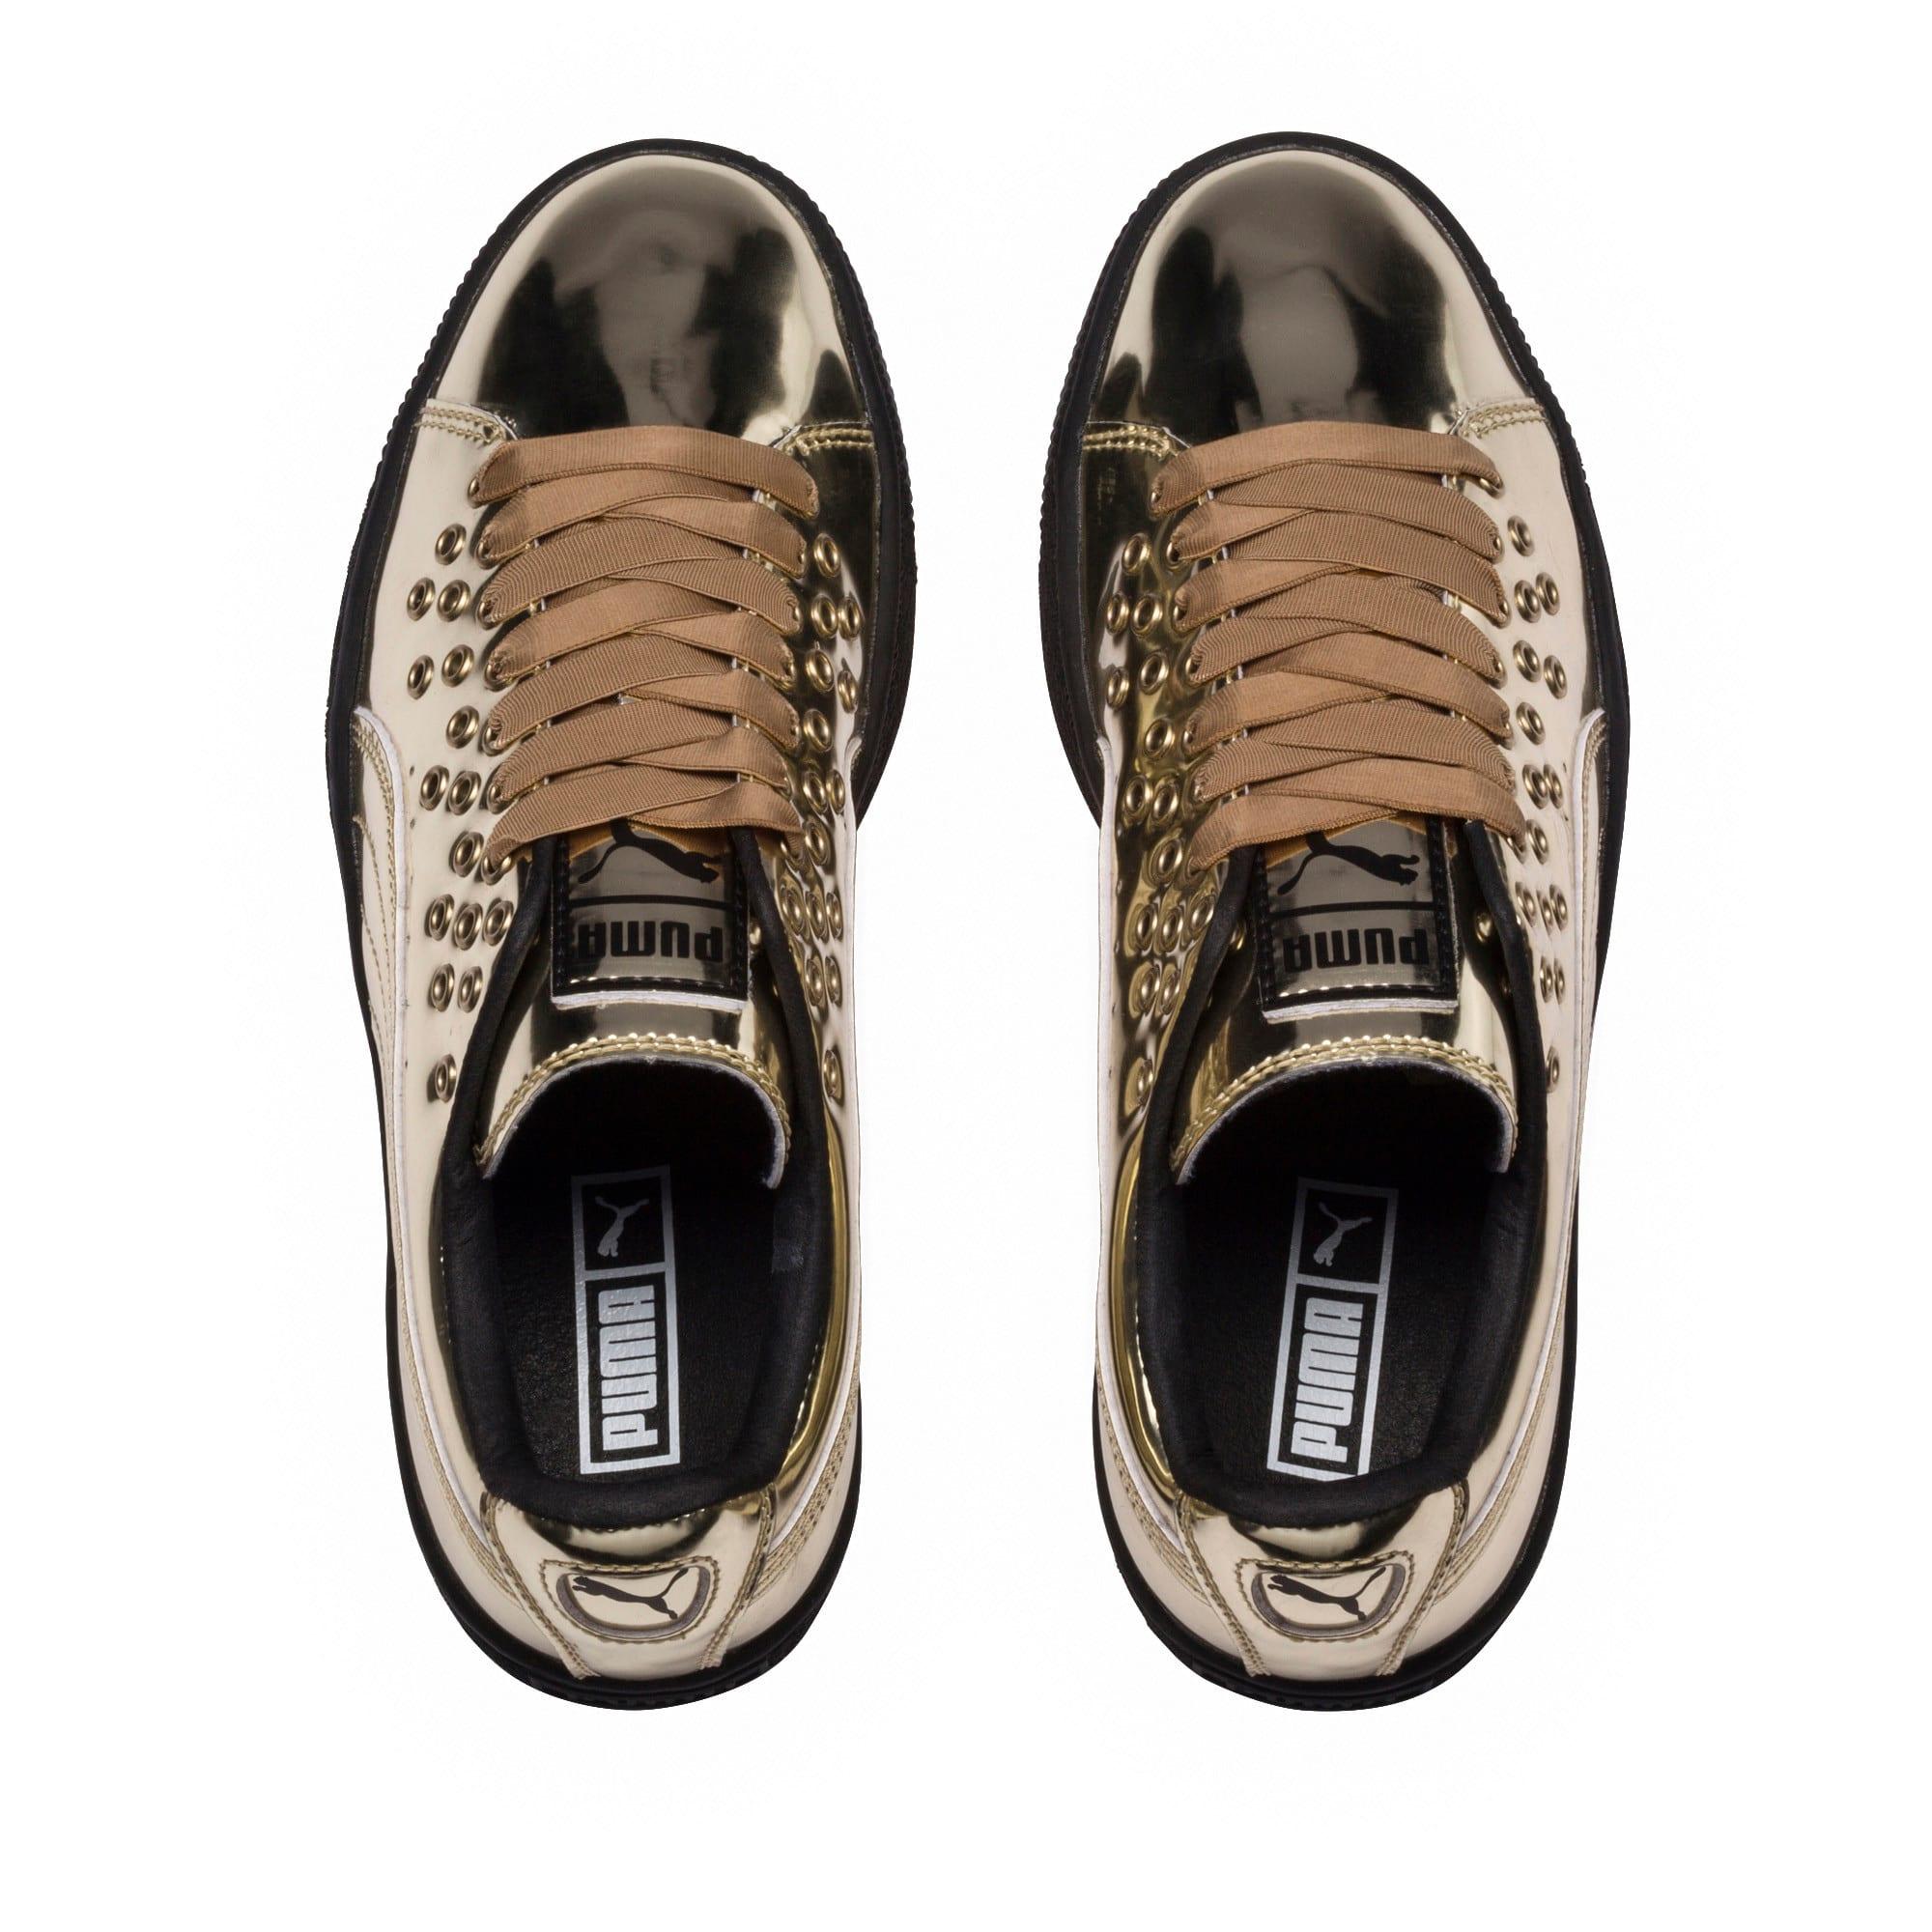 Basket XL Lace Metal Women's Sneakers